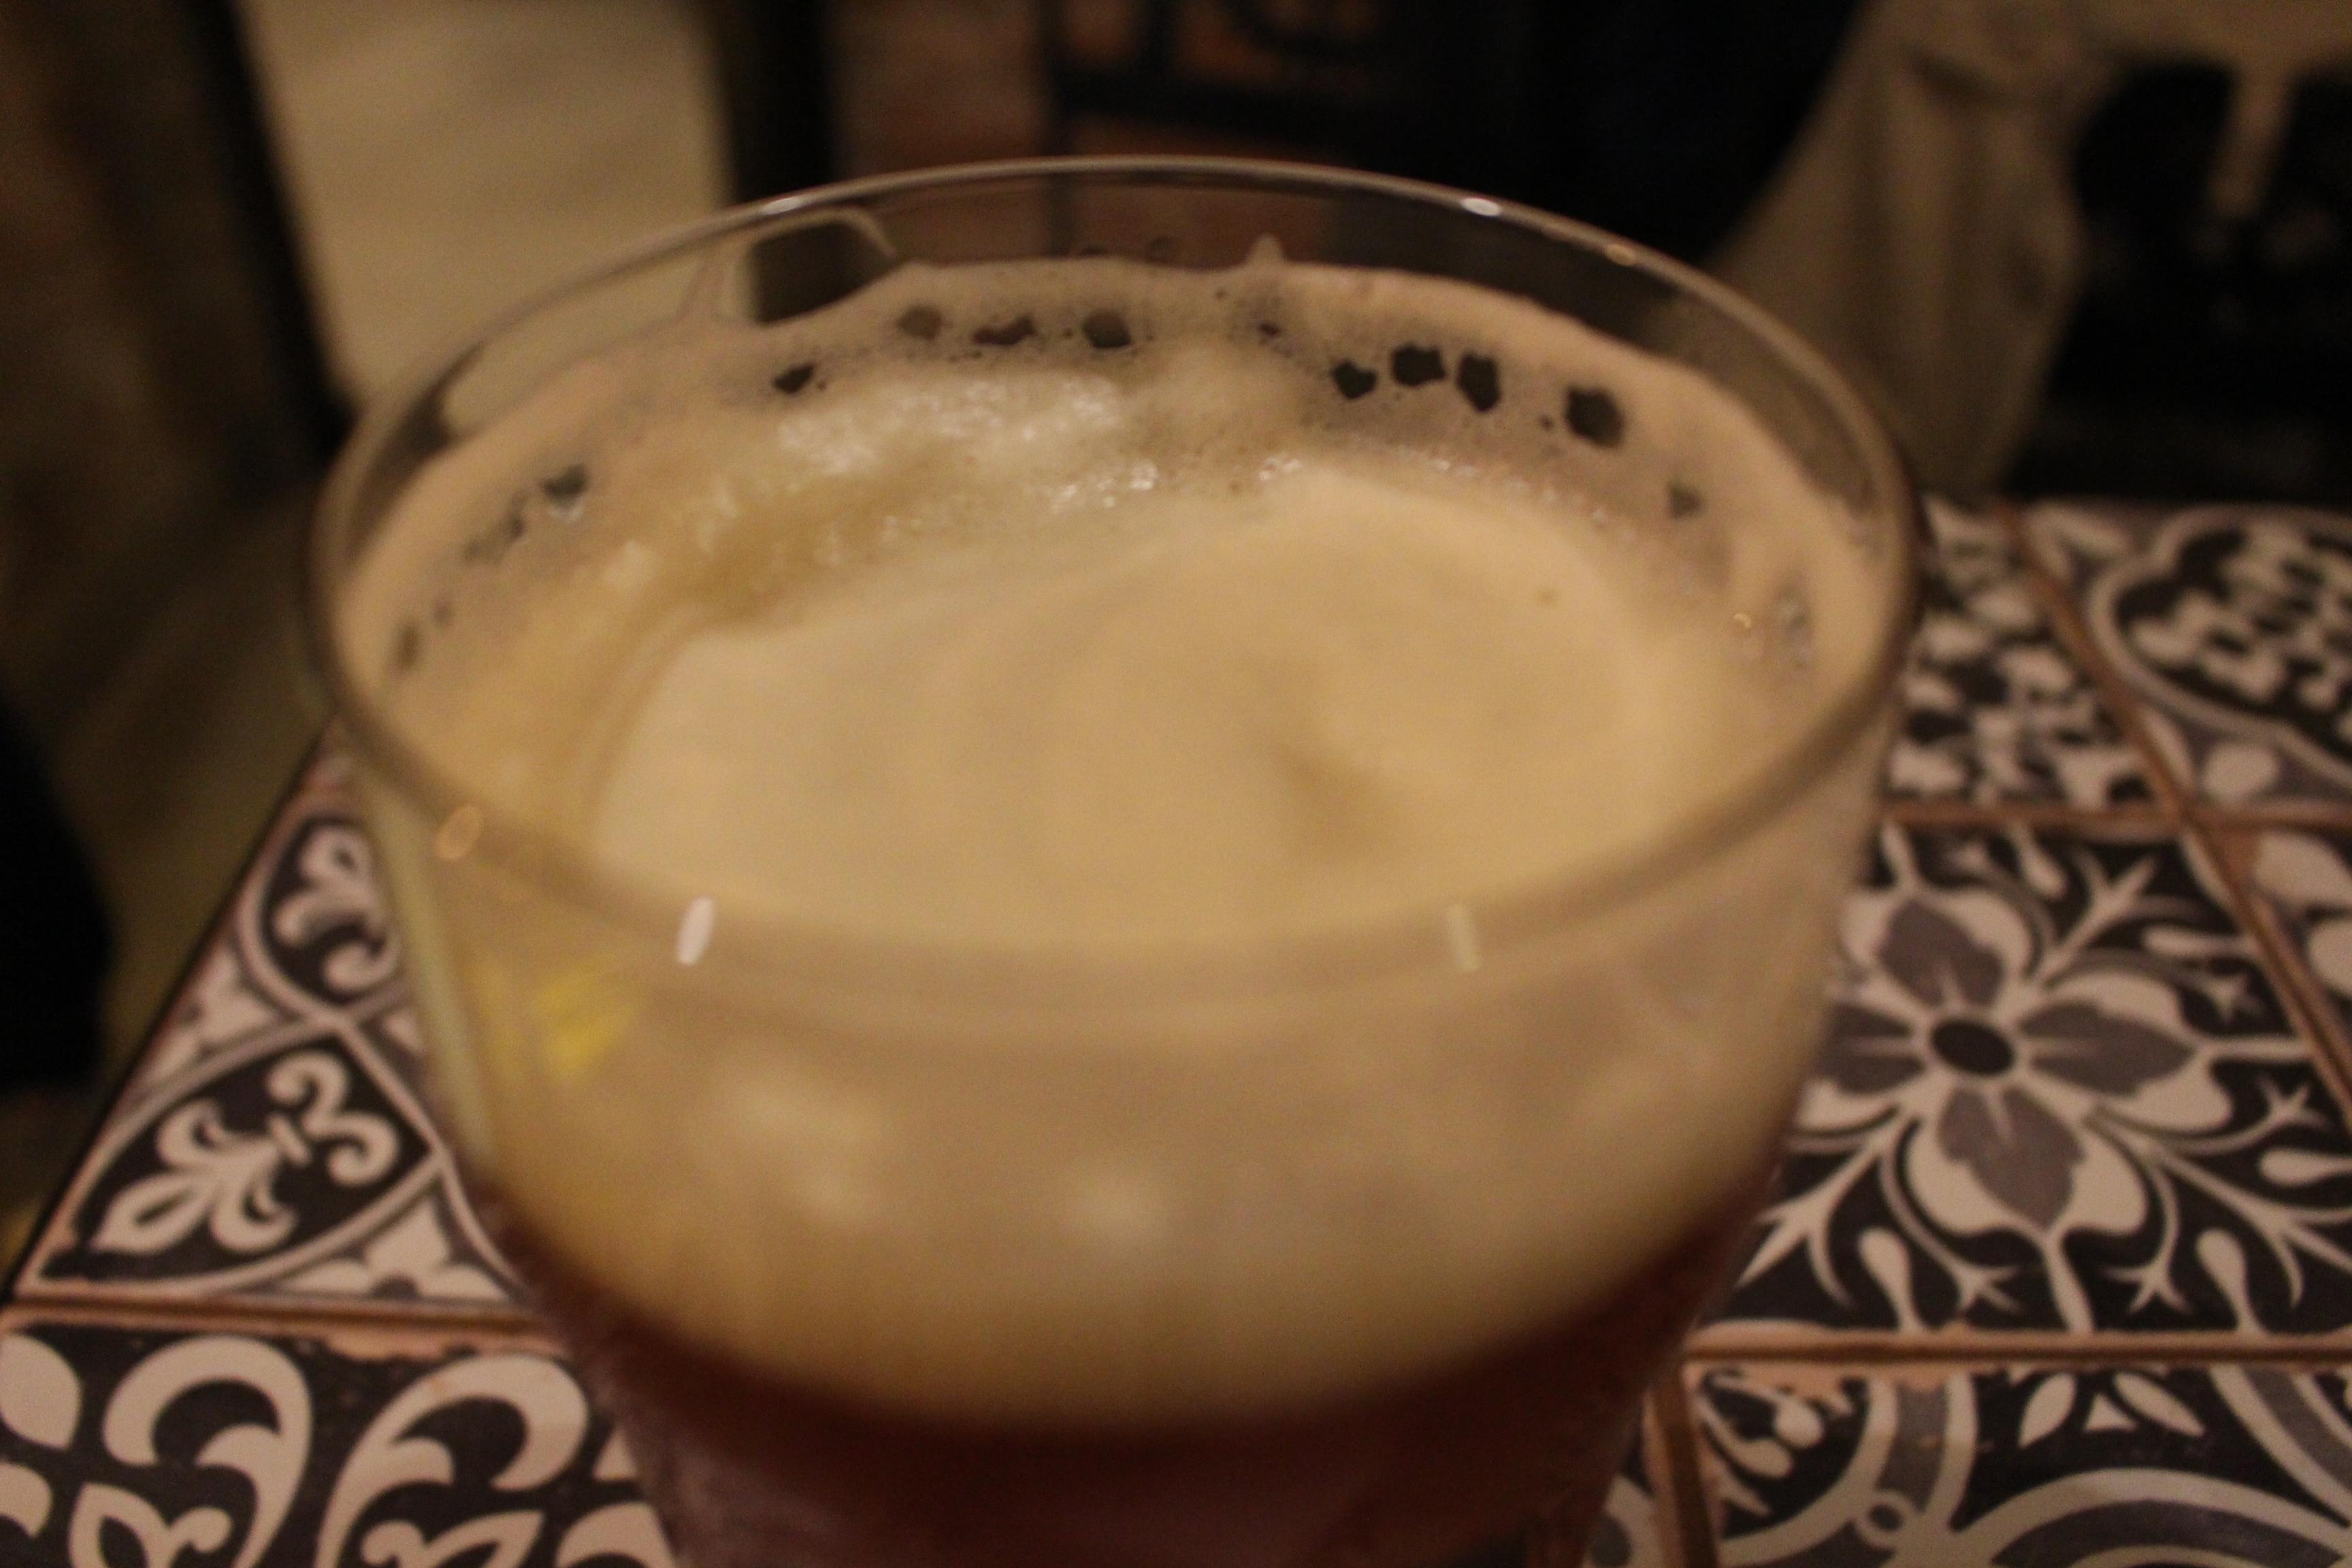 Valamipa bemutató -Csupor Craft Beer